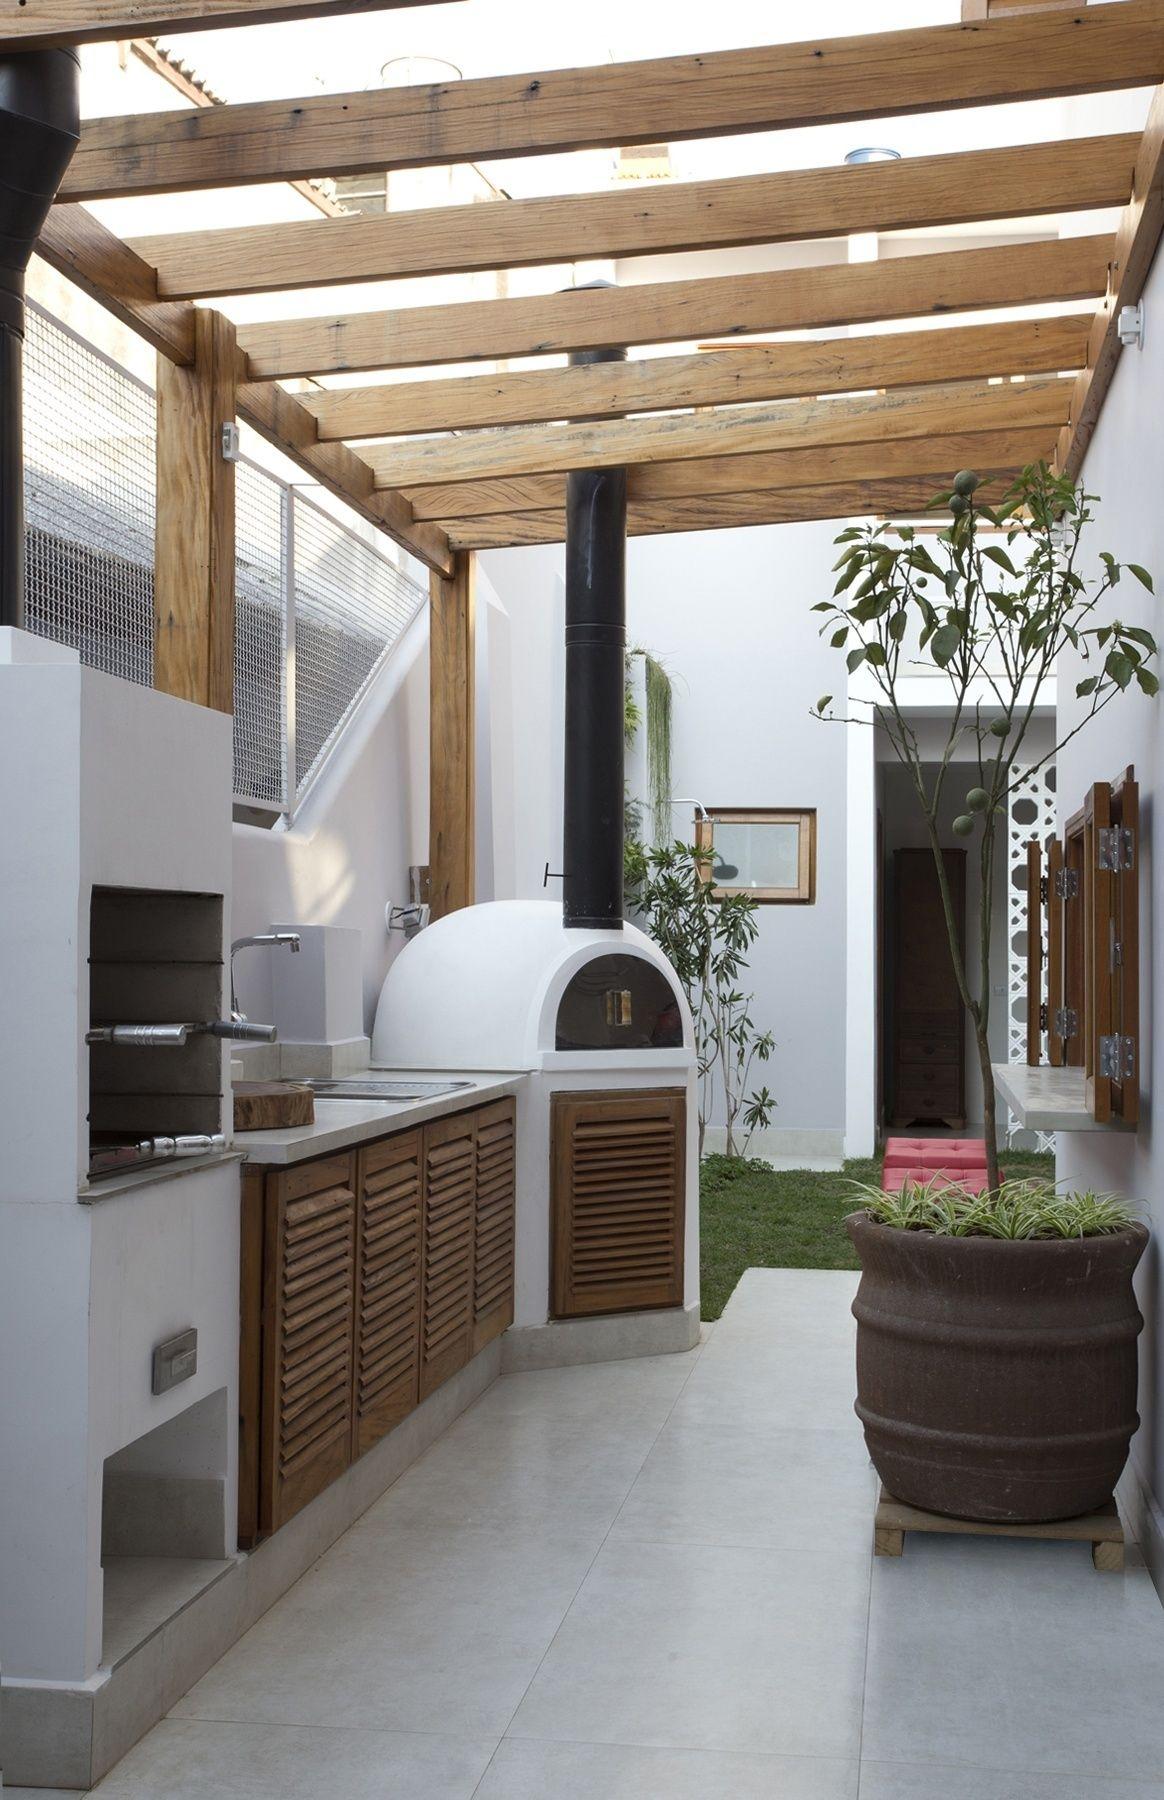 jardim corredor lateral - Google Search  건축 water  Pinterest  야외 생활 ...